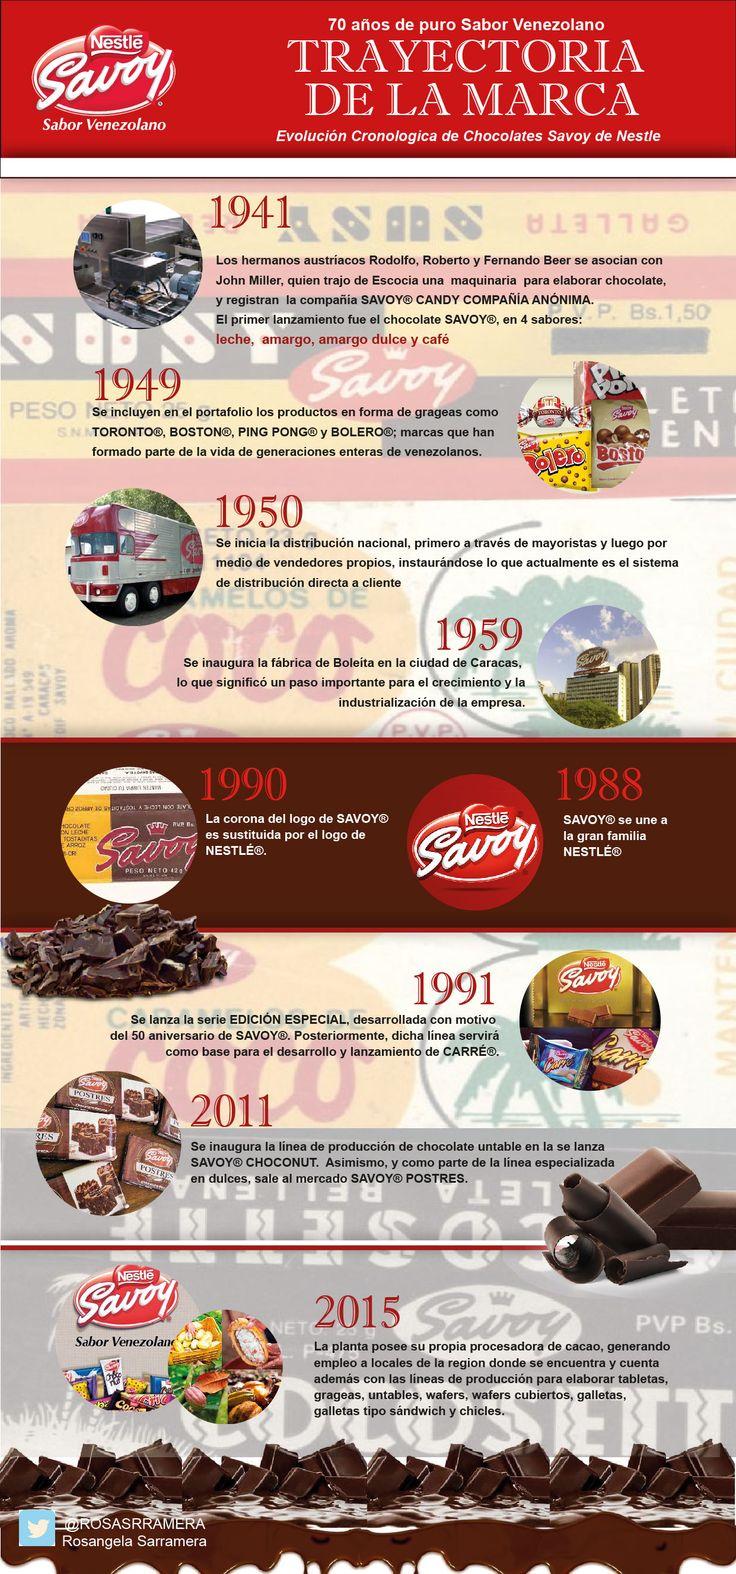 14 best Chocolate Savoy images on Pinterest | Chocolate ...